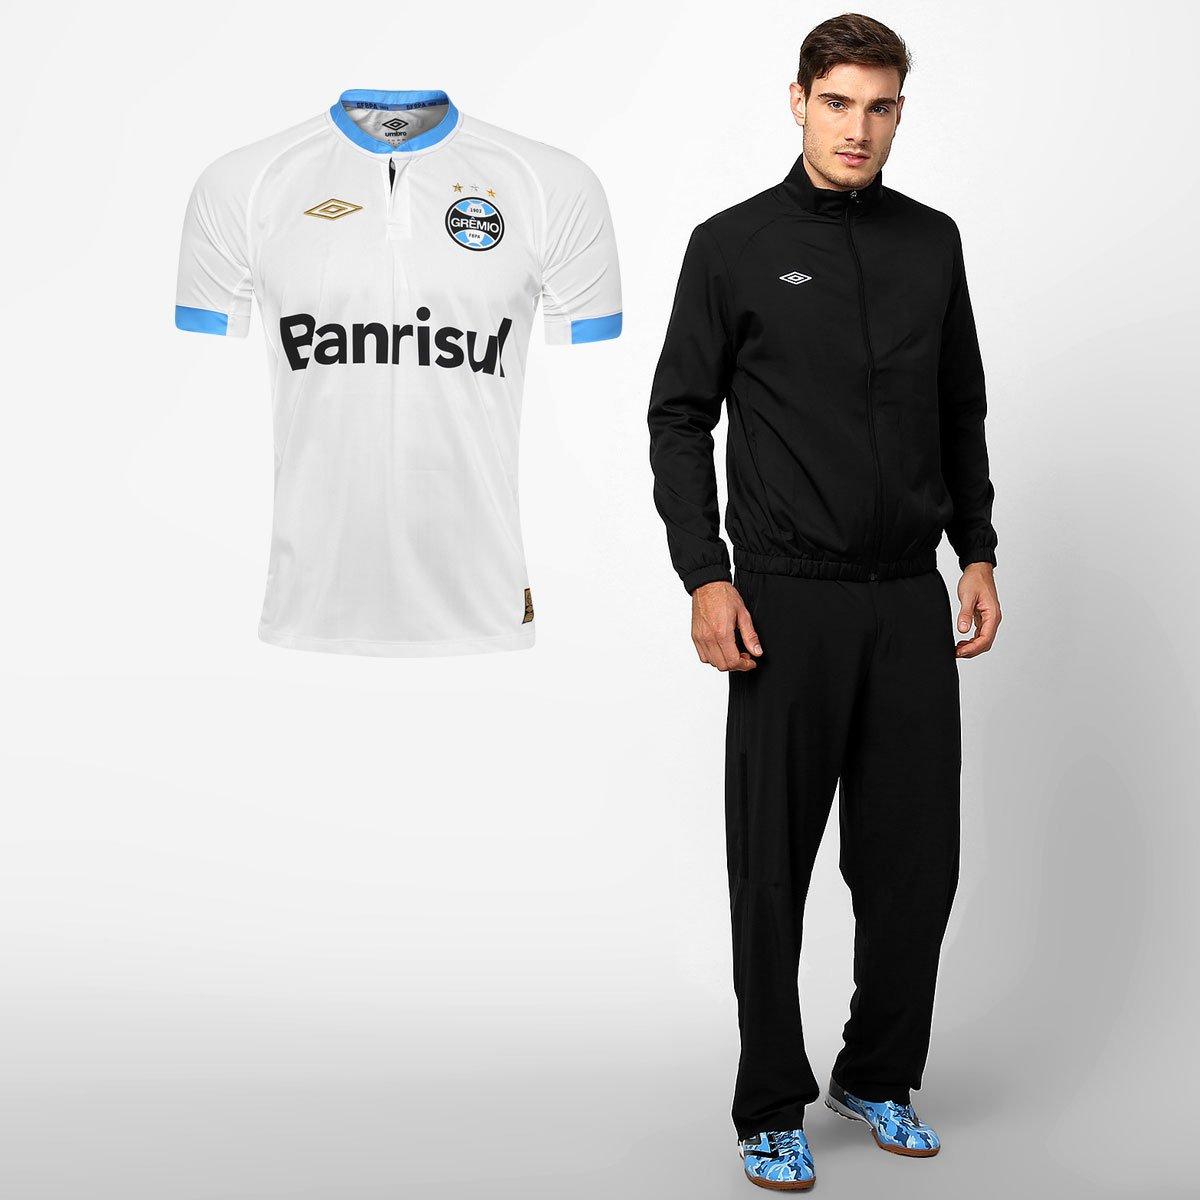 Kit Grêmio - Camisa Umbro Grêmio II 2015 + Jaqueta Umbro - Compre Agora  67107183f7ab8